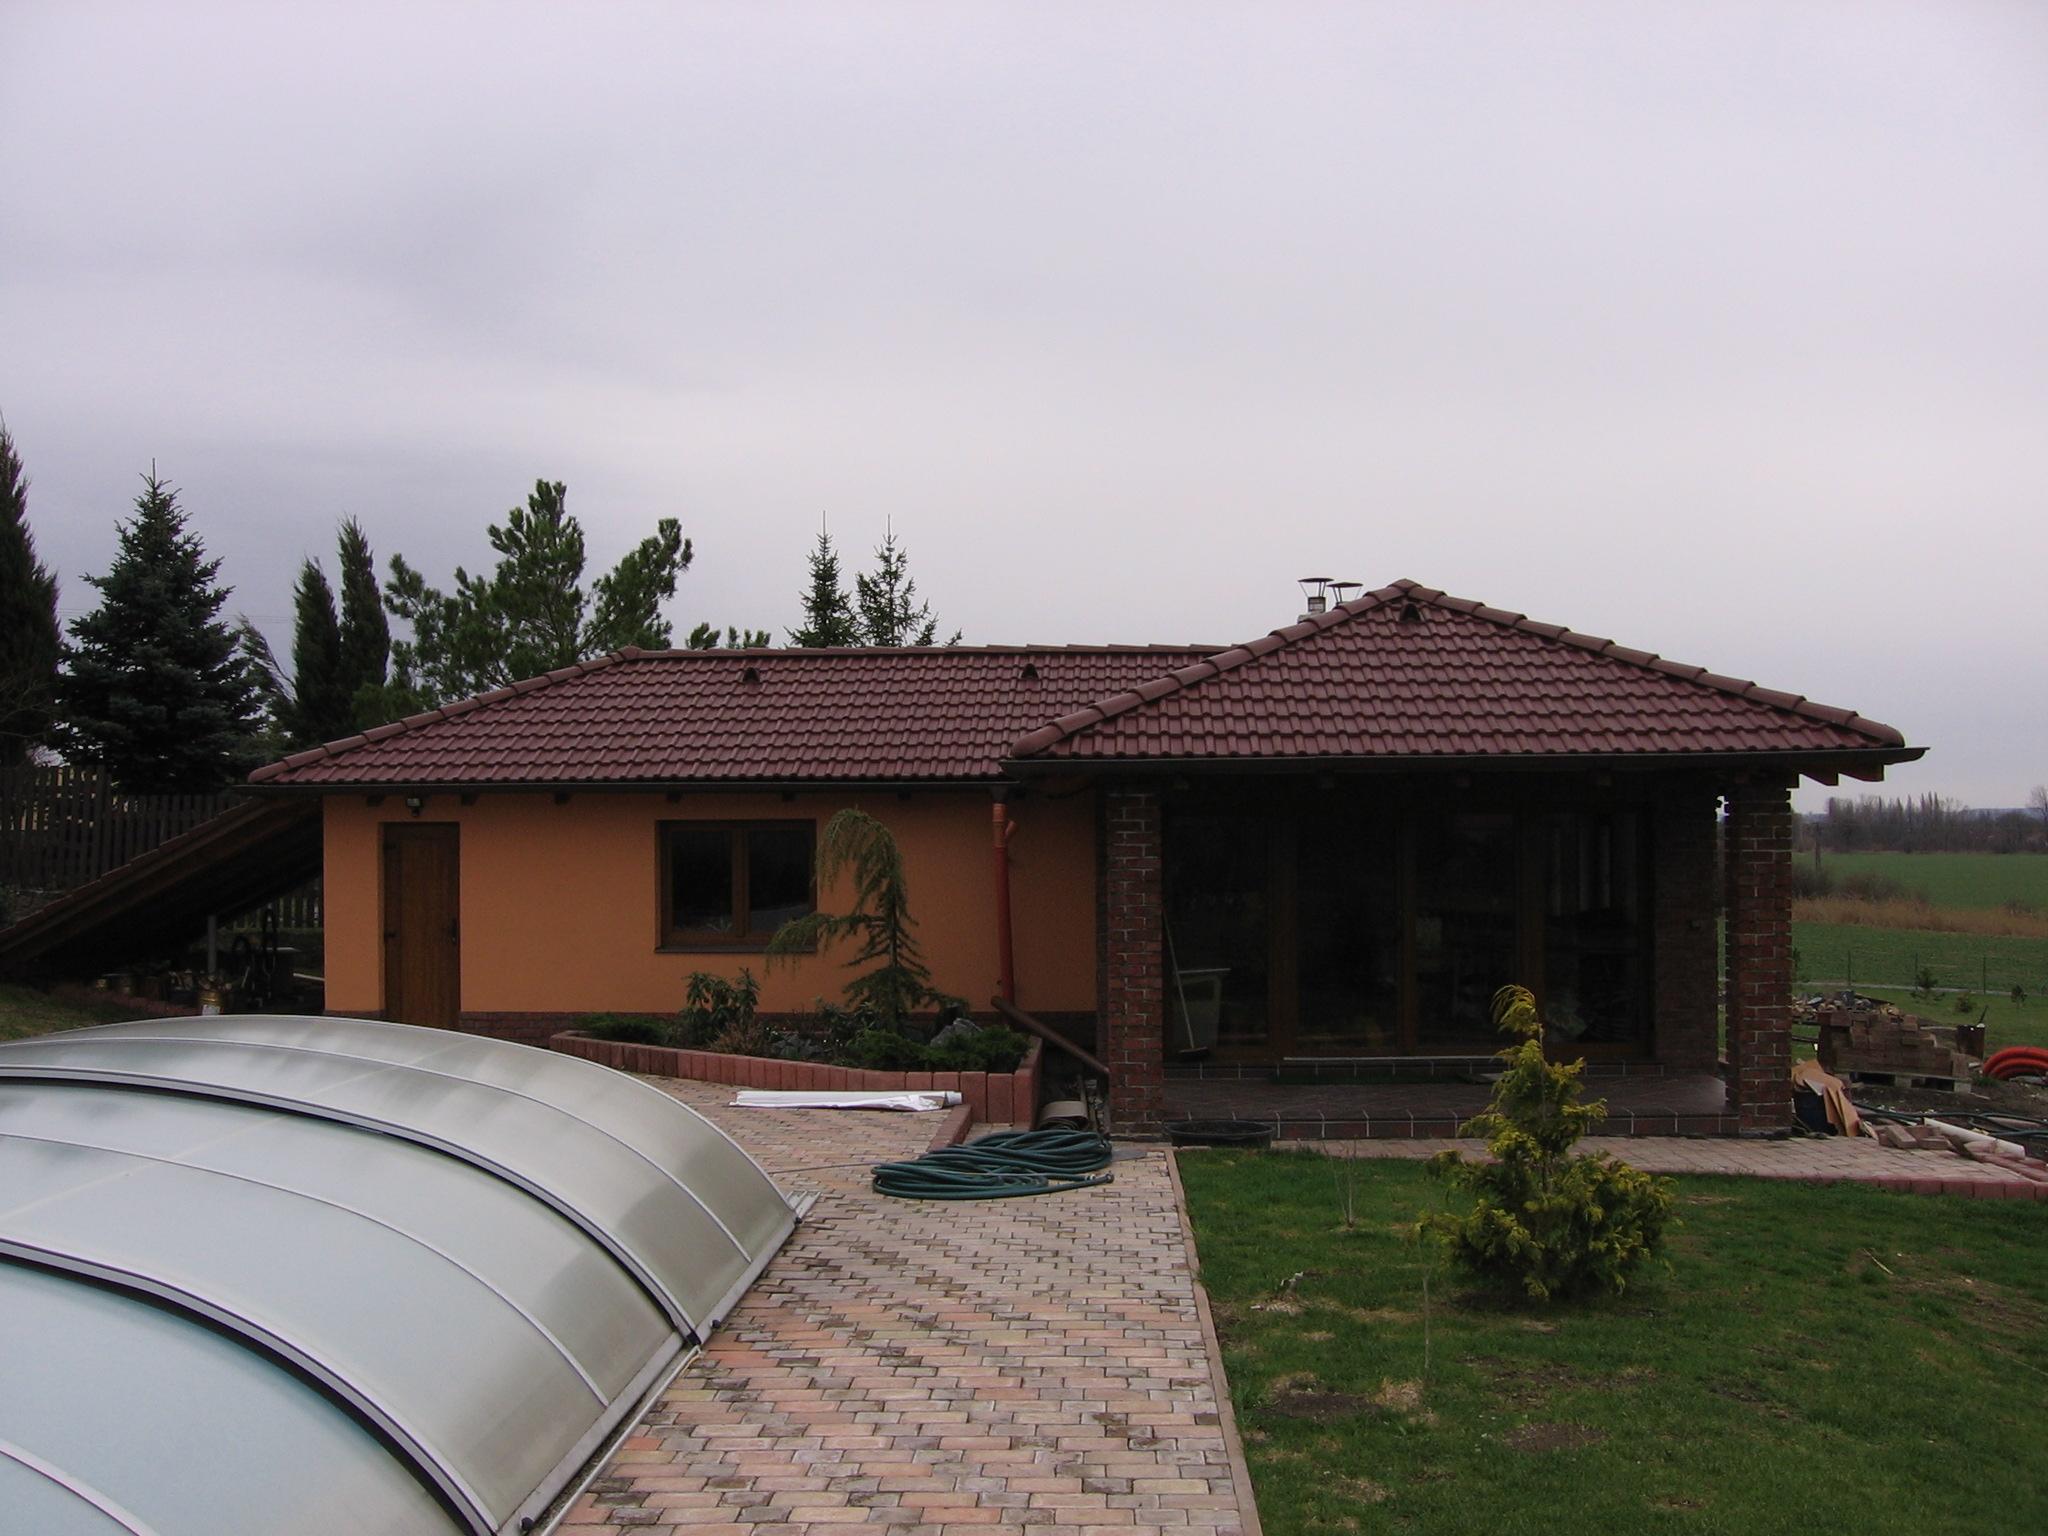 betonovc3a1-krytina-bramac3